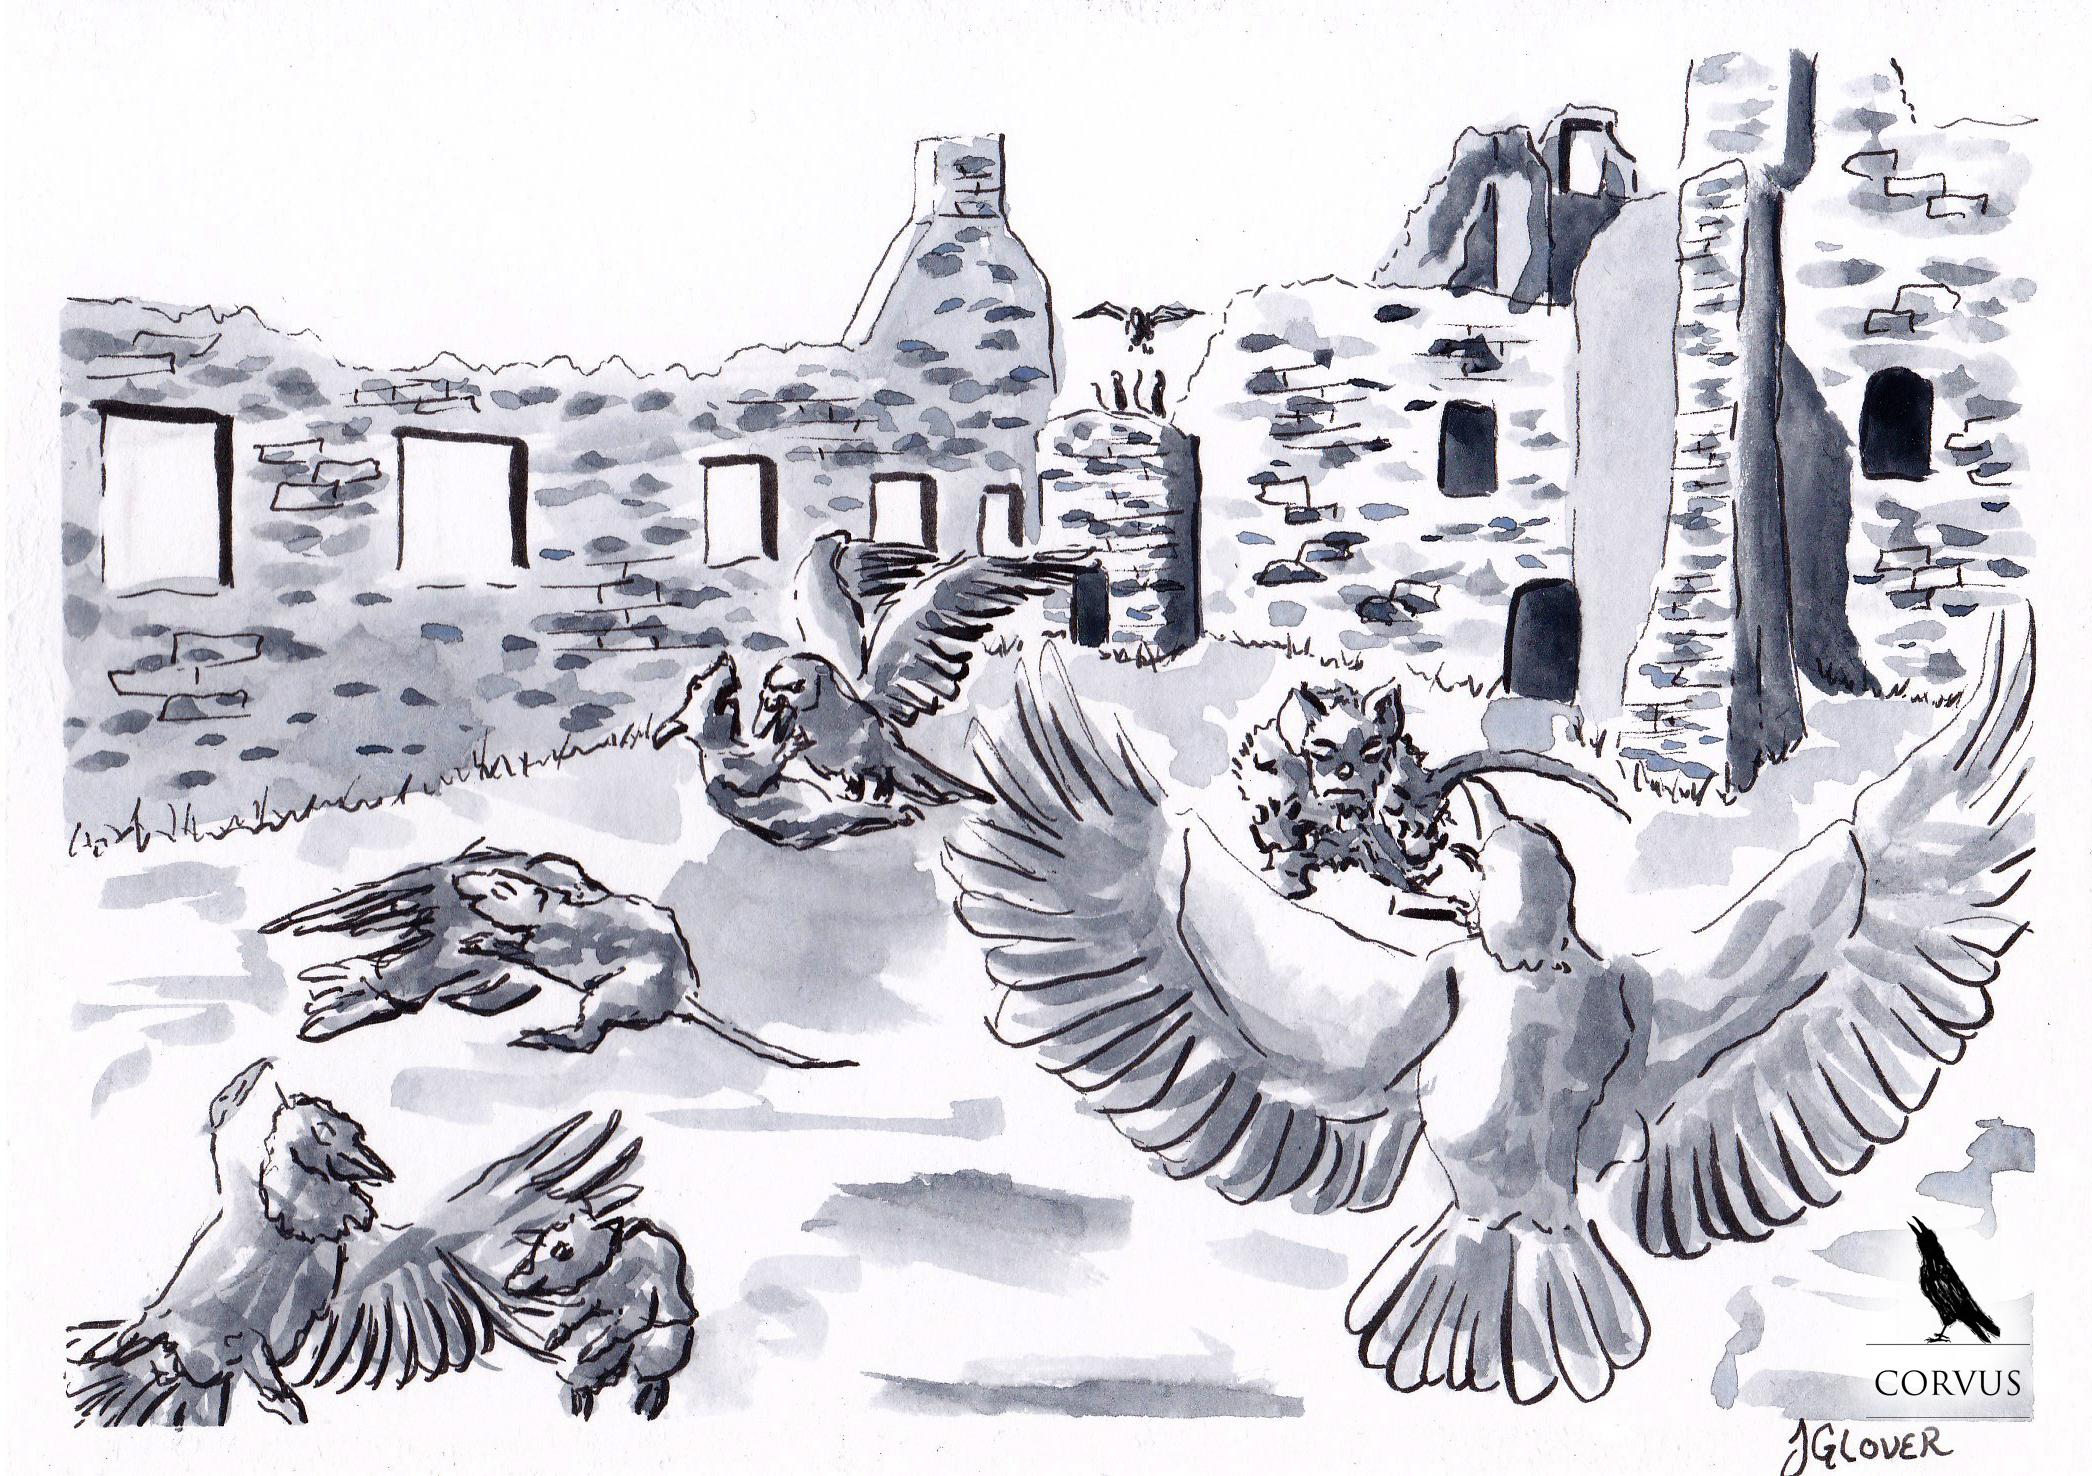 corvus graphic novel ink drawing art illustration graphic novel folk lore history